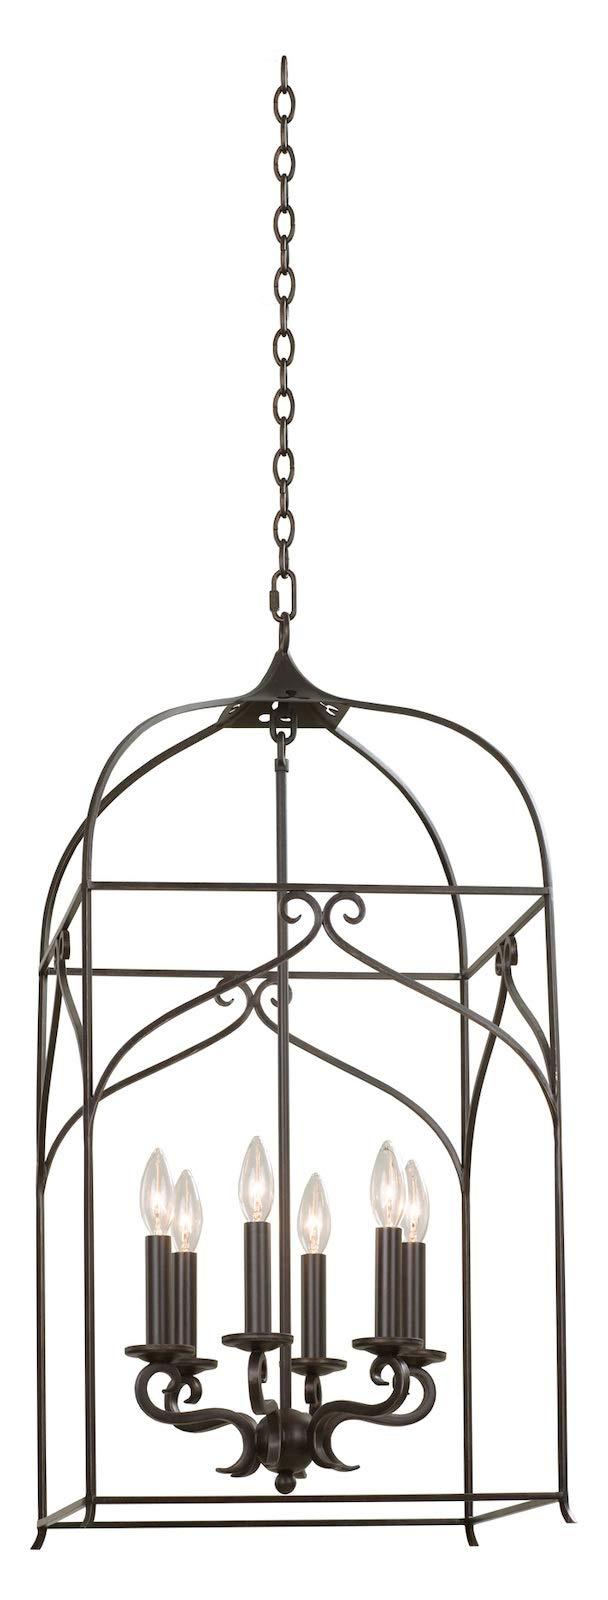 Somers Medium Hanging Lantern Heirloom Bronze